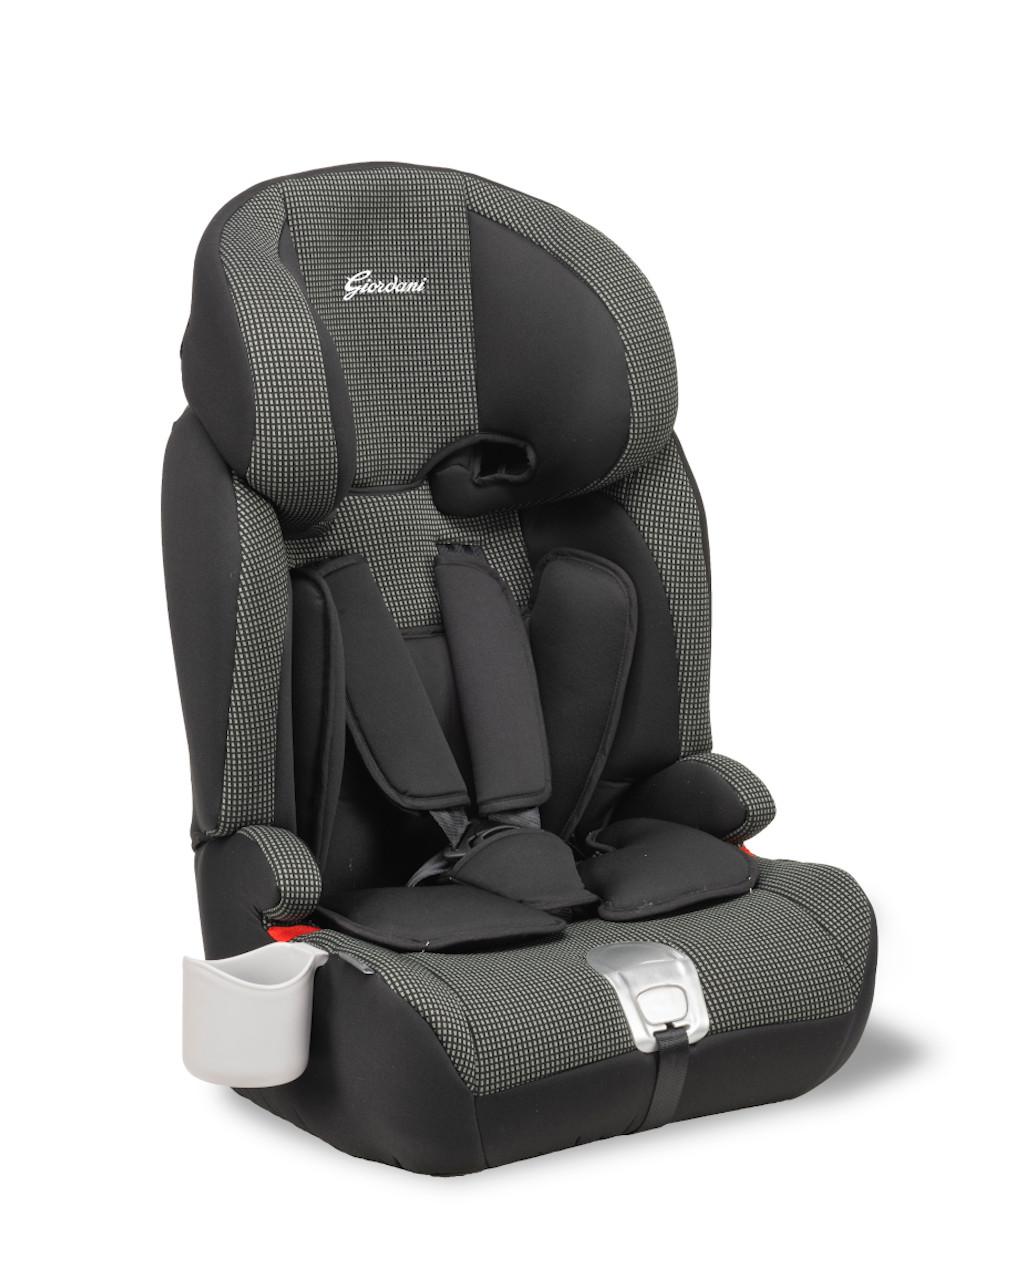 Giordani Κάθισμα Αυτοκινήτου  PEGASUS 2.0  ΟΜ.1-2-3 Μαύρο